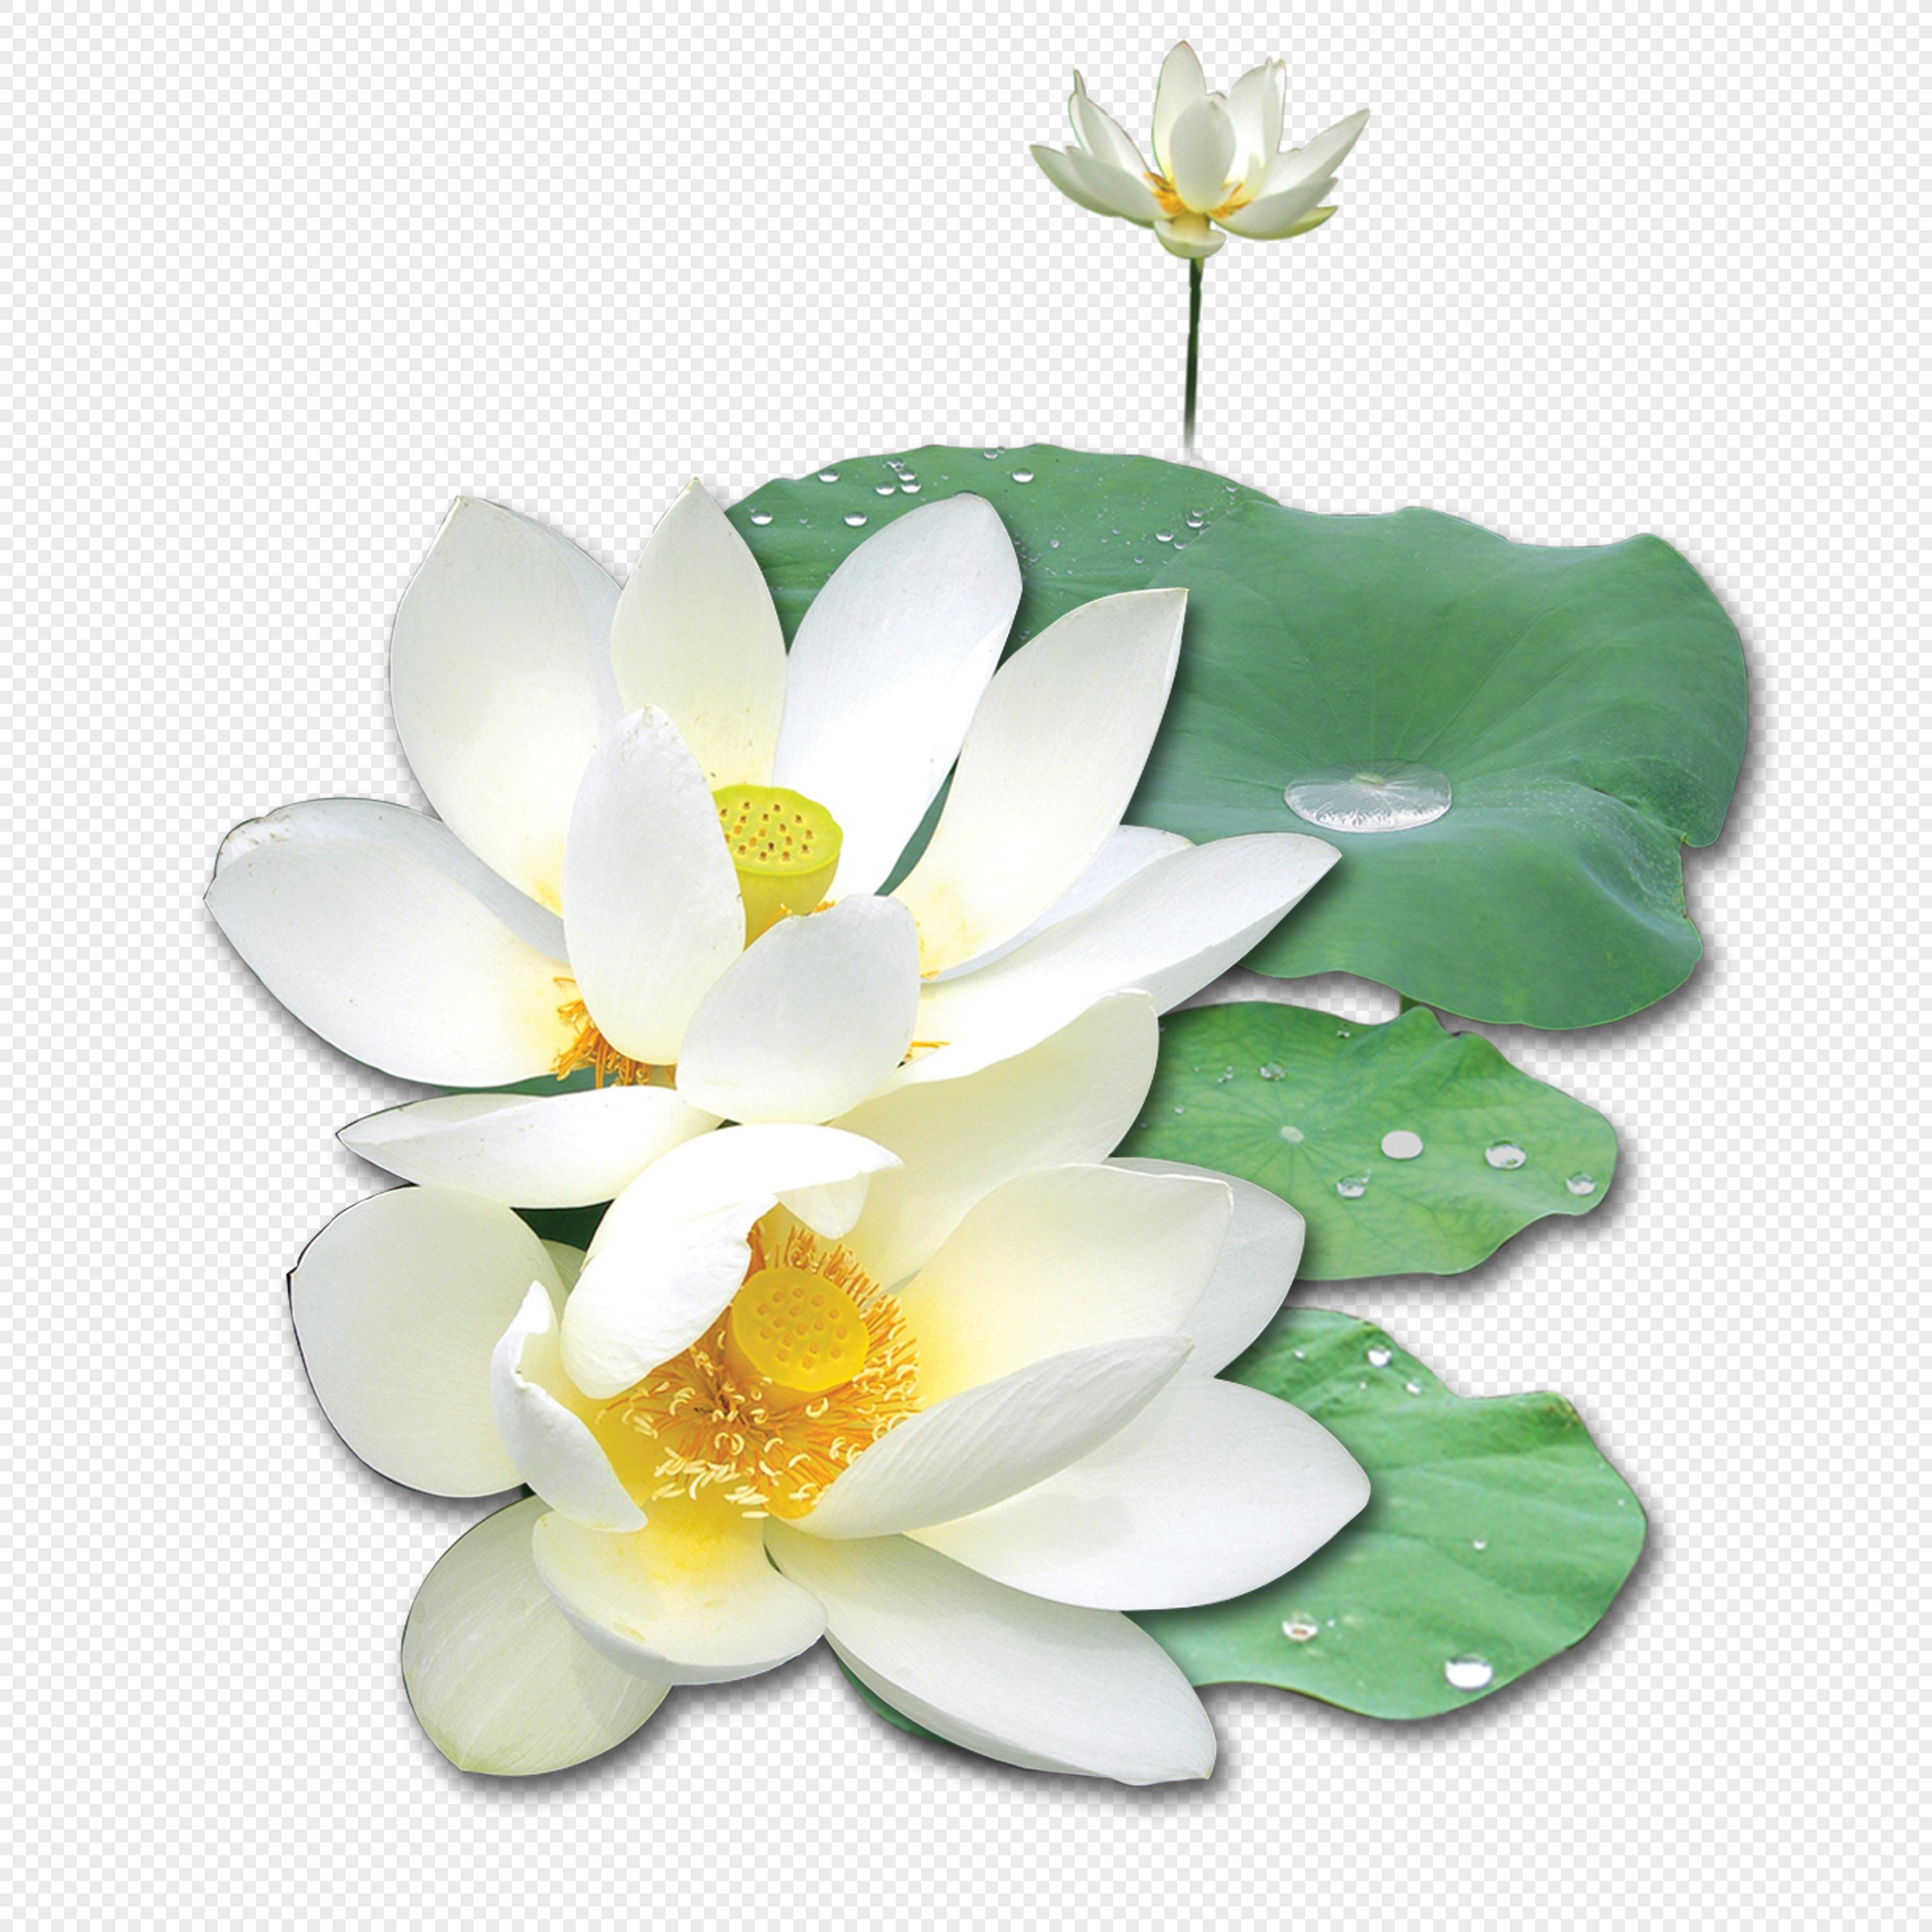 White Lotus Flower Png Imagepicture Free Download 400457102lovepik